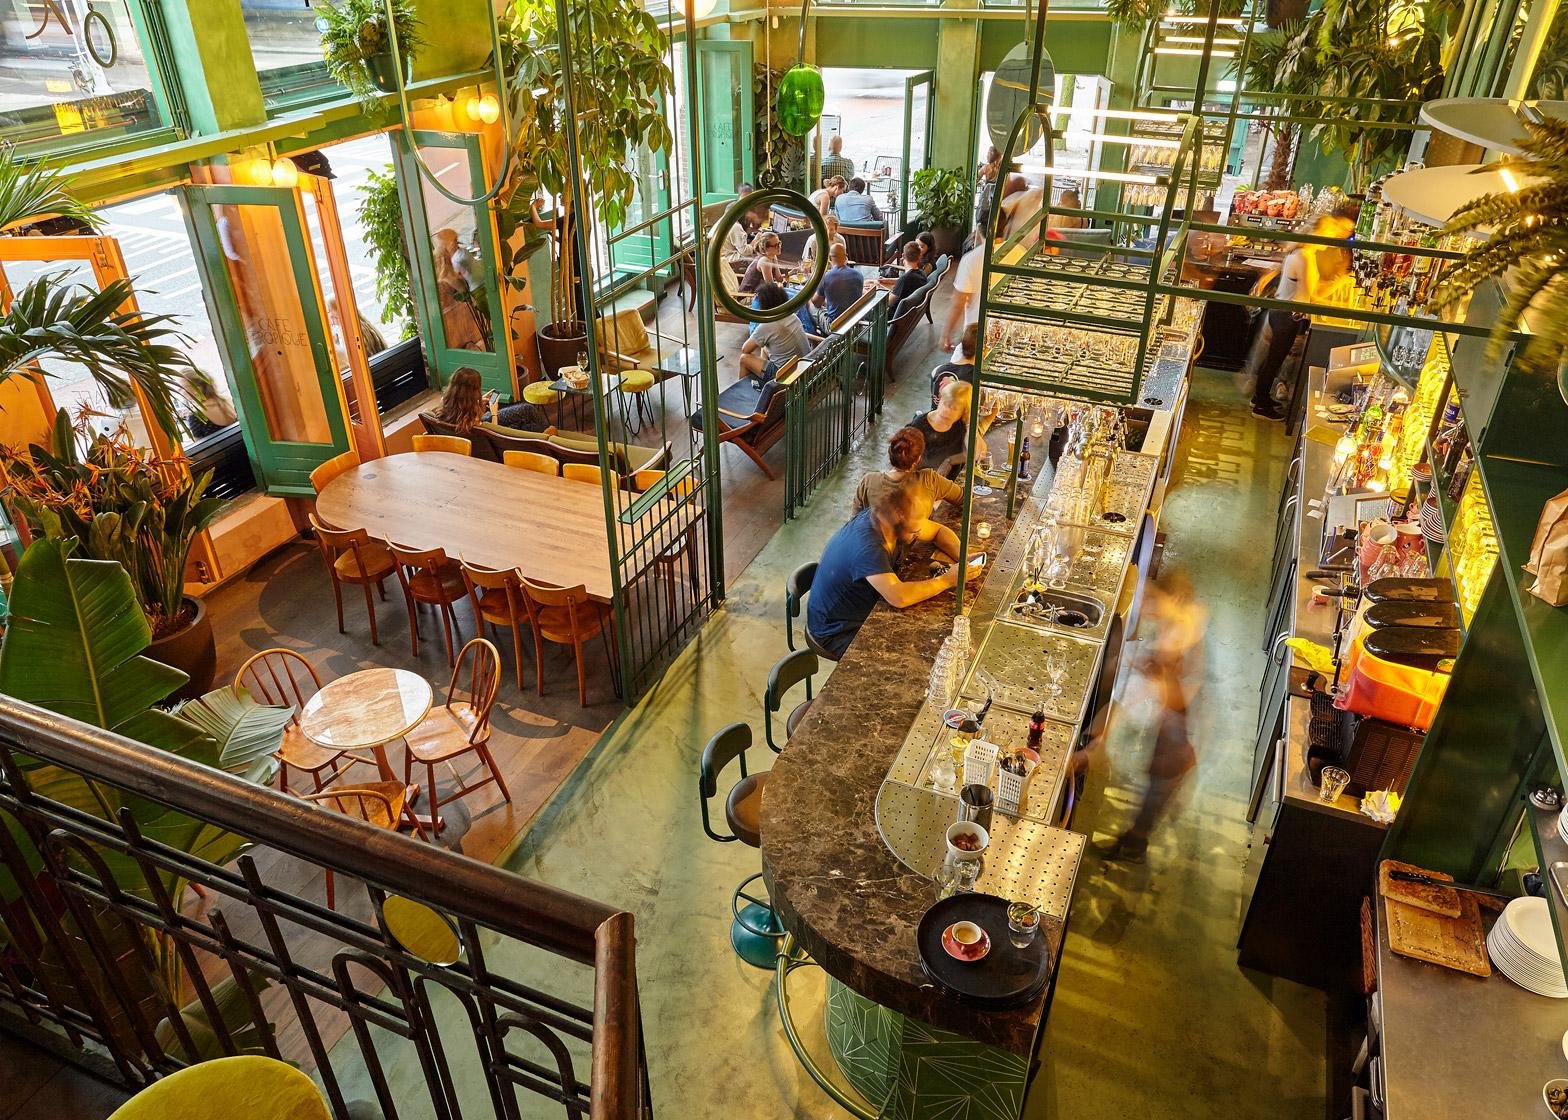 Studio Modijefsky Fill An Amsterdam Bar With Rainforest Foliage